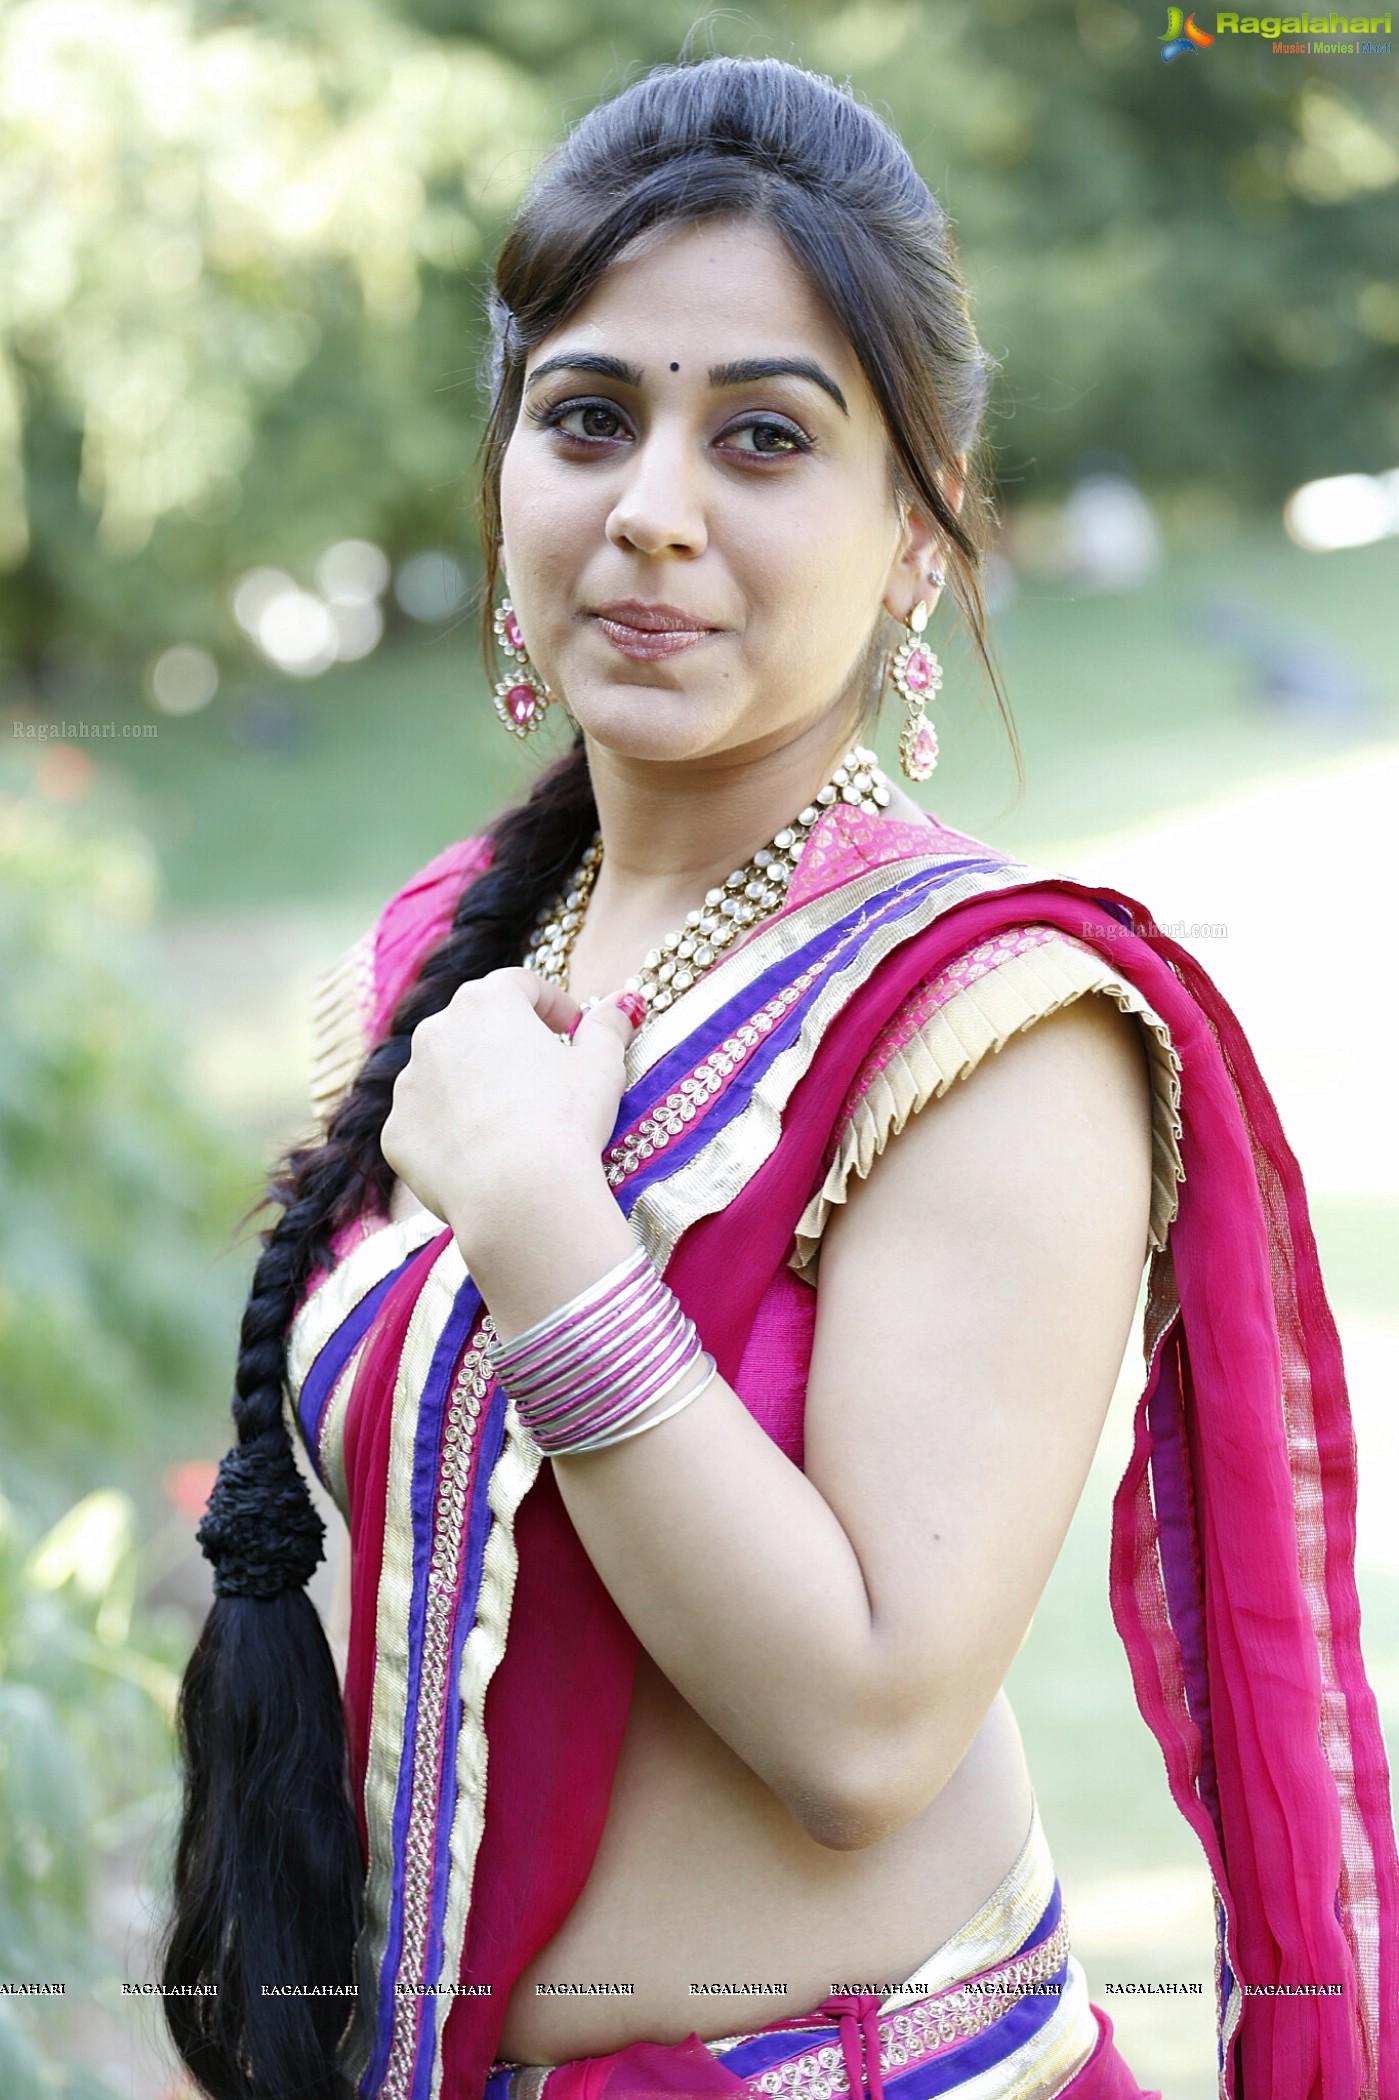 aksha pardasany posters image 11 telugu actress hot